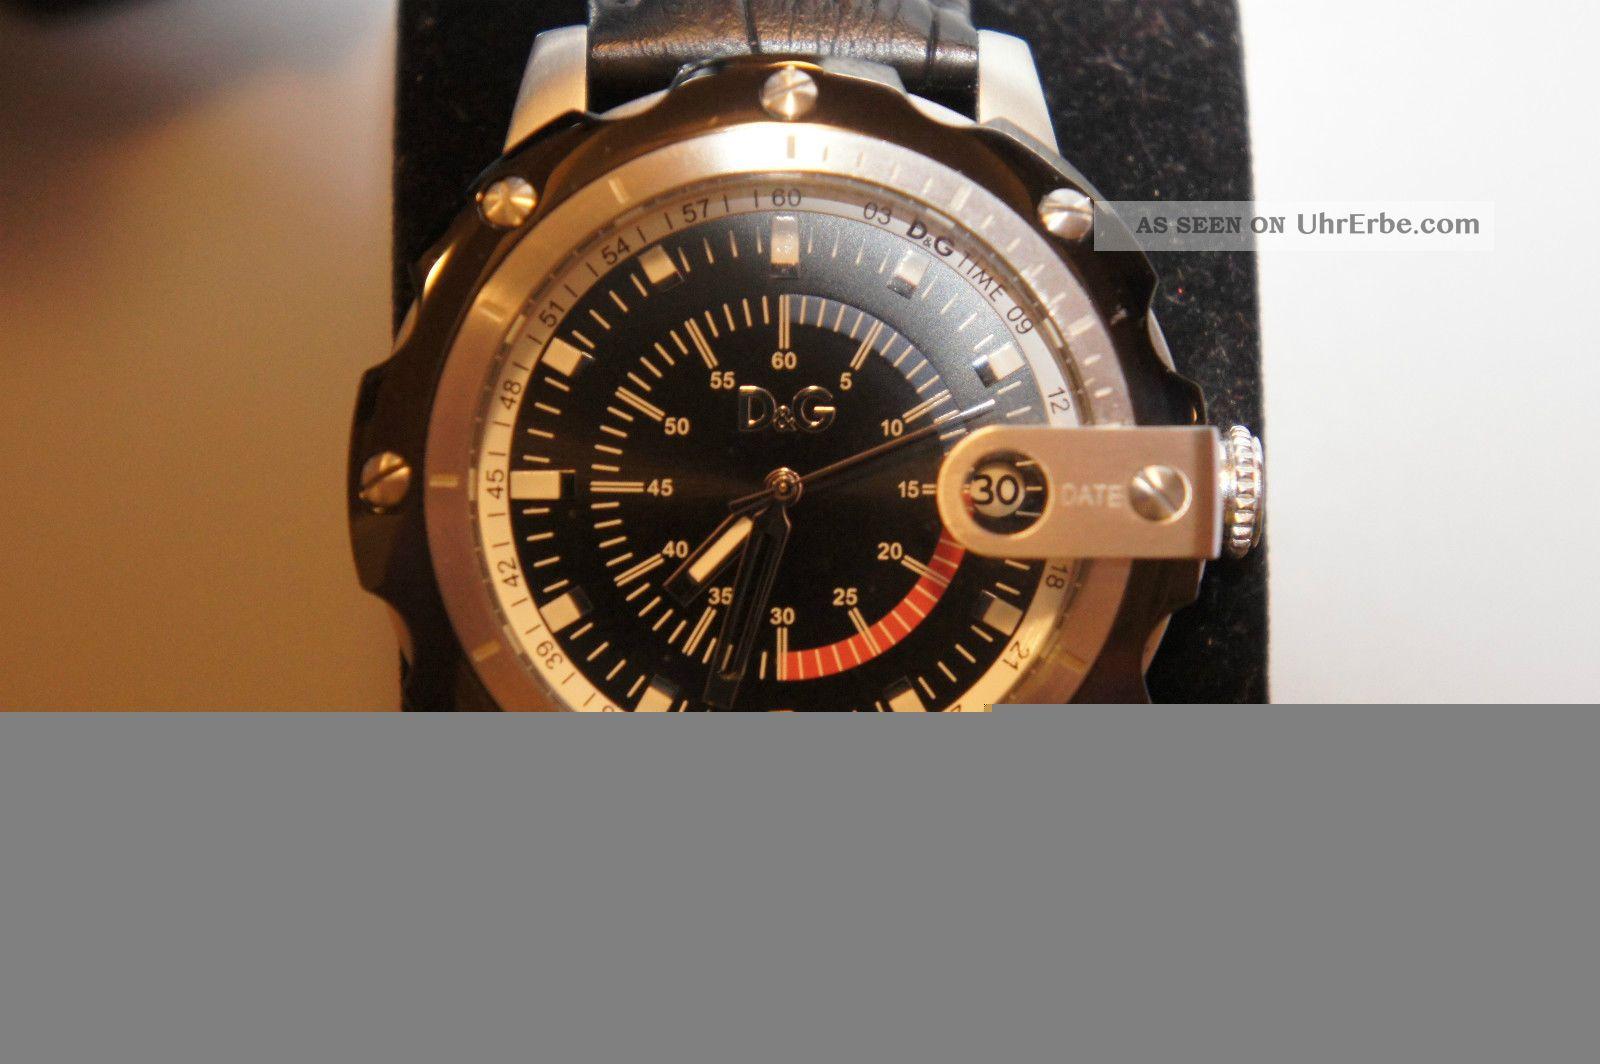 D & G Time Armbanduhr Herren Dolce Gabbana Armbanduhren Bild